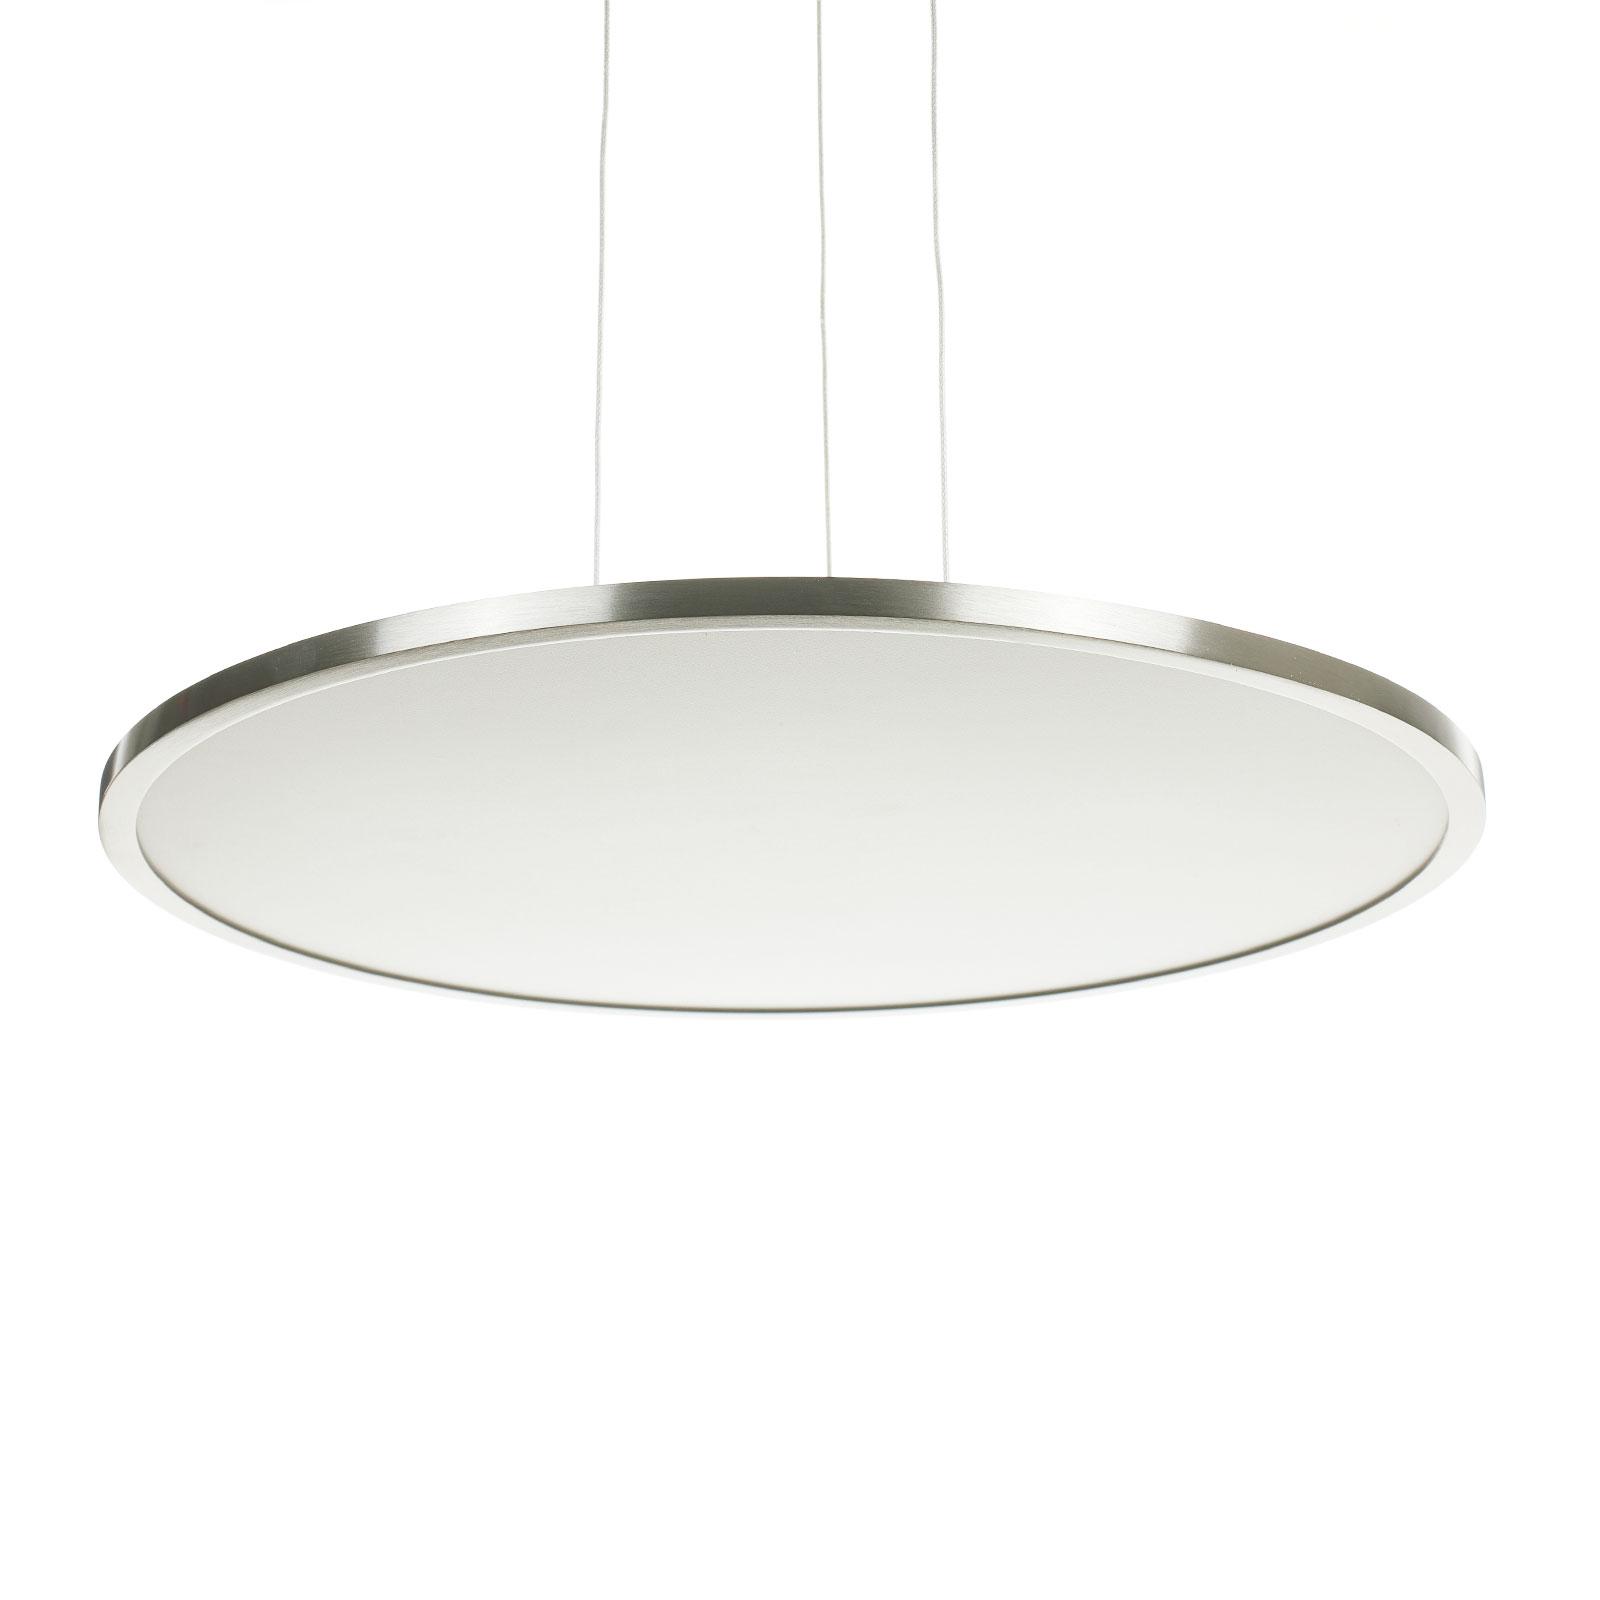 Acquista Lampada a sospensione LED Ceres dimmerabile